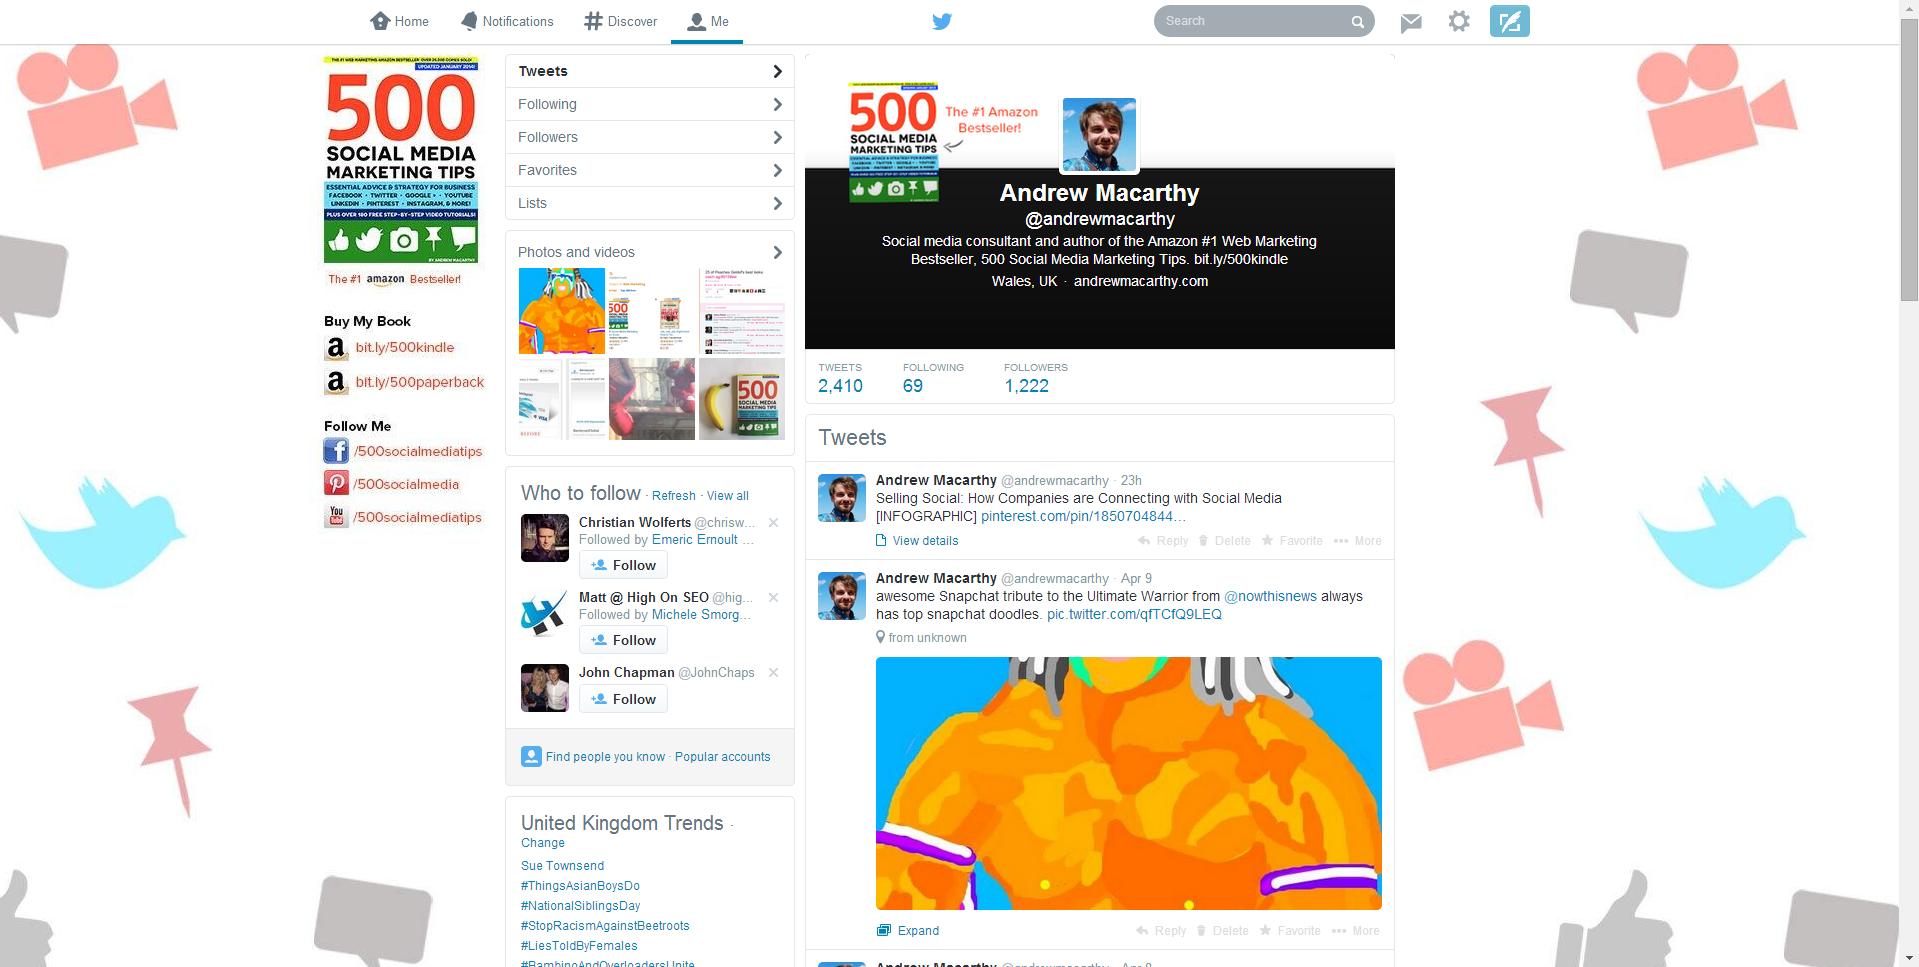 twitter-header-template-2014.PNG